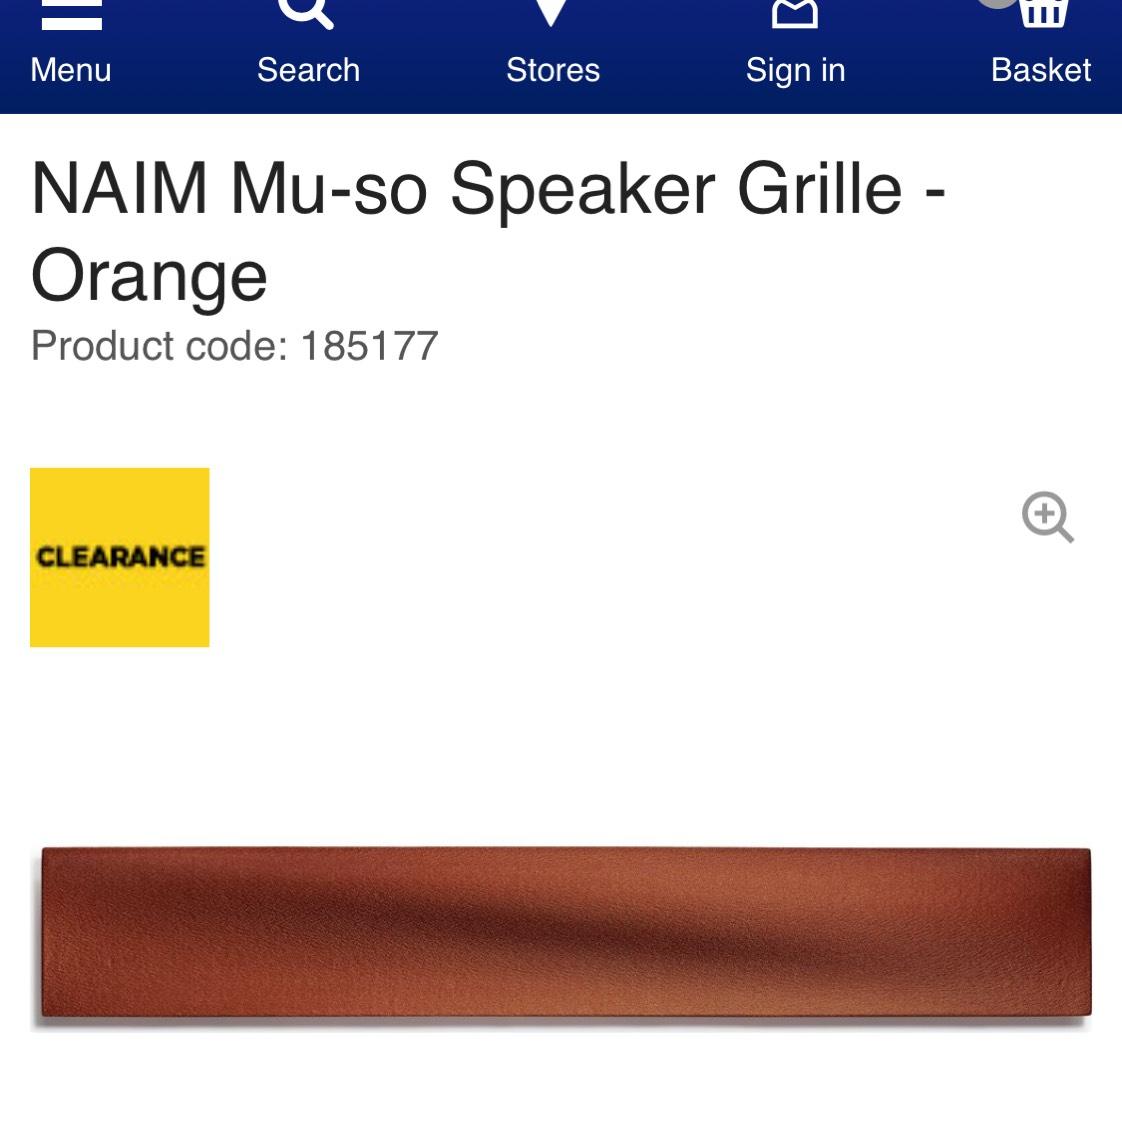 Naim Mu-so speaker grille Orange at Currys for £19.97